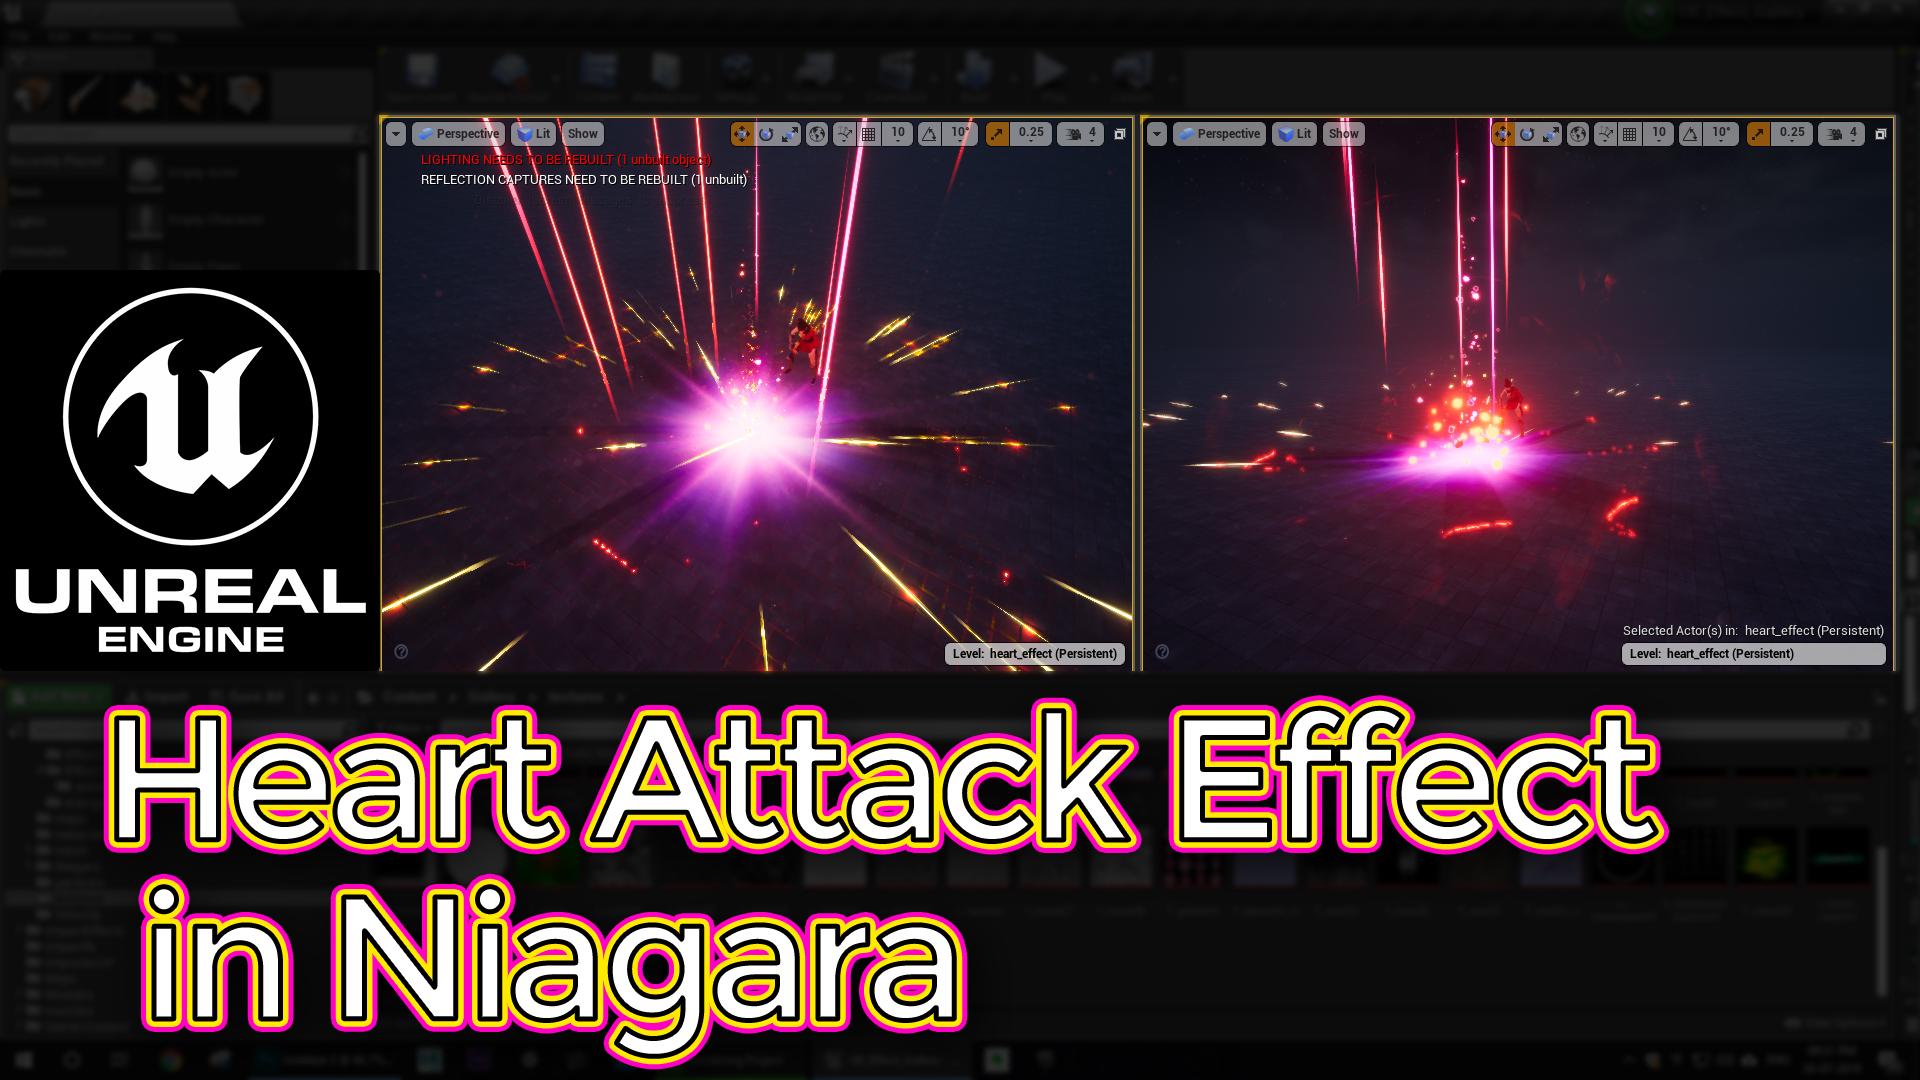 Unreal Engine Heart Attack Effect in Niagara Tutorial